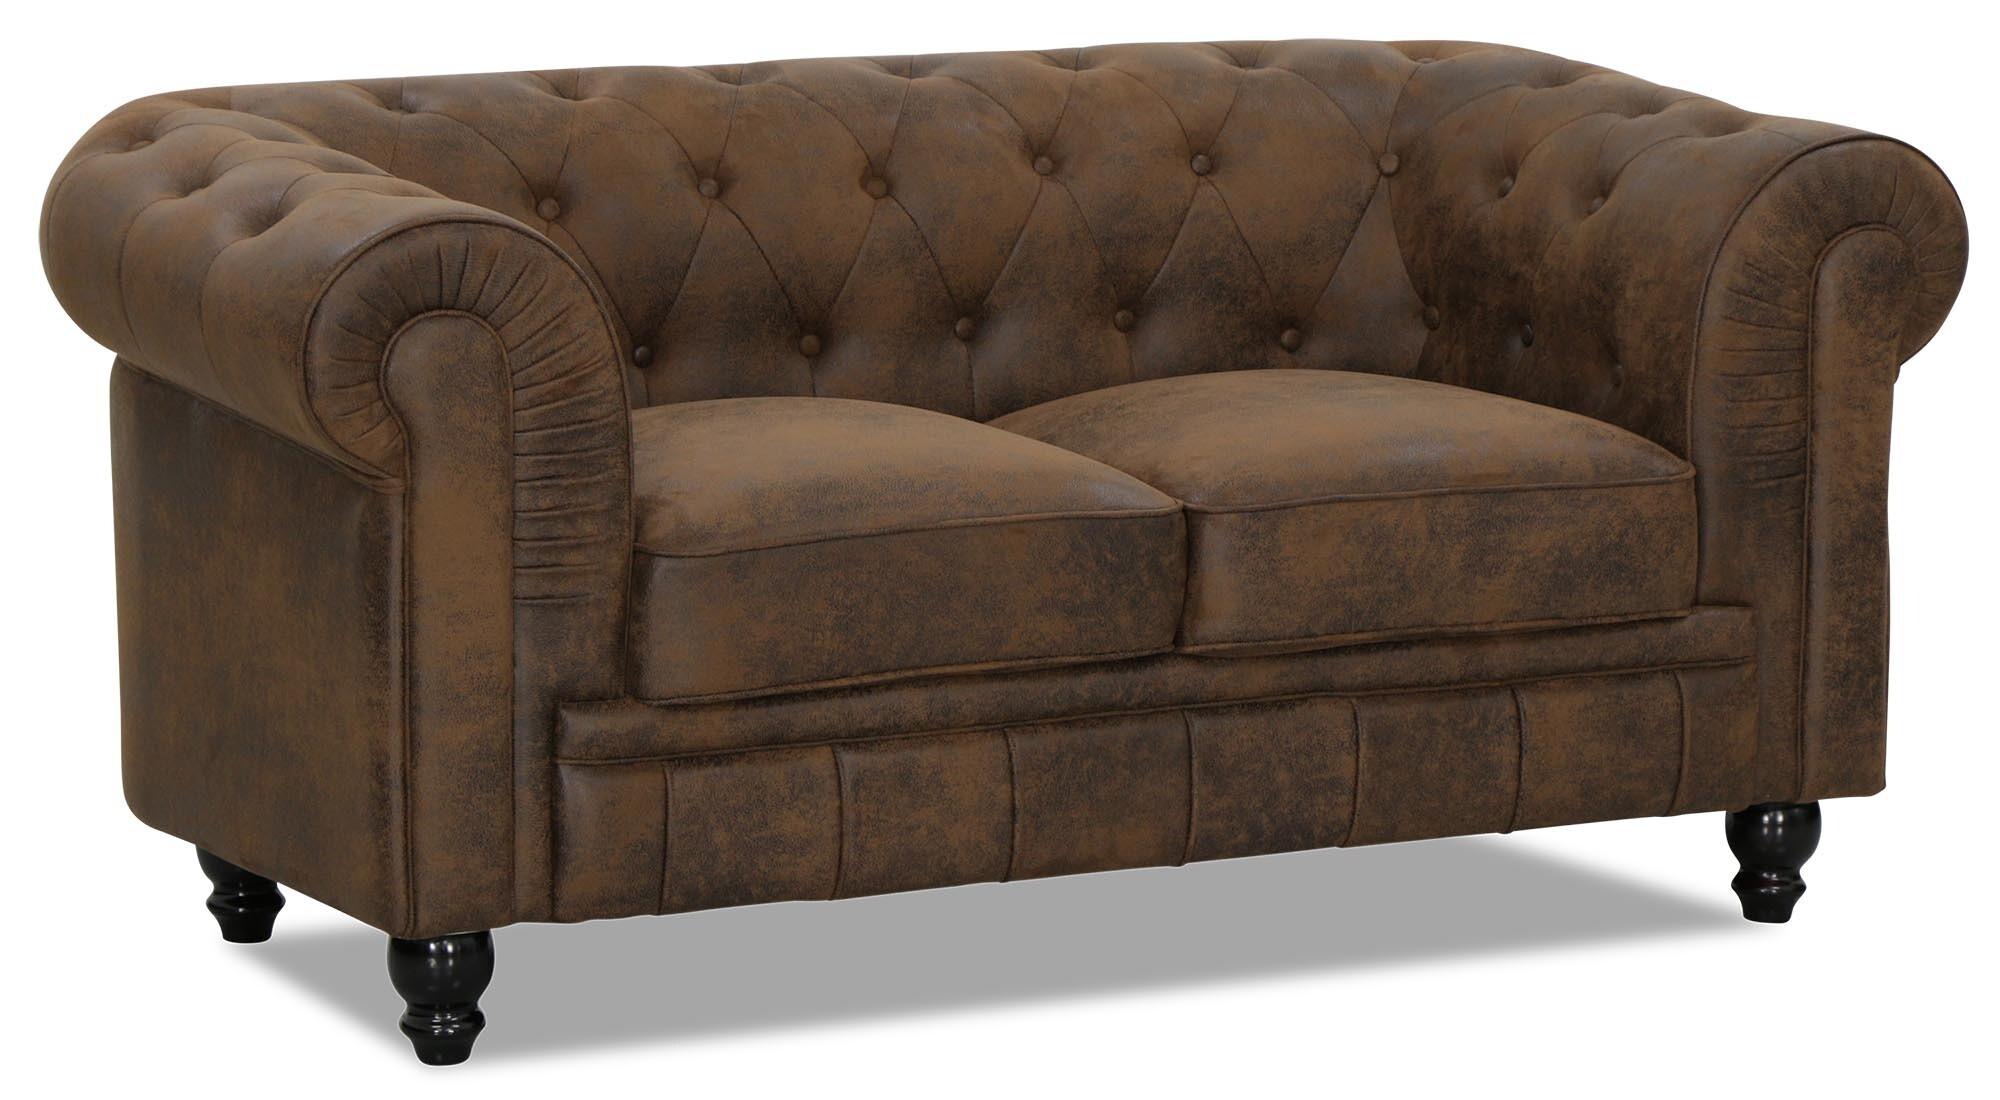 Benjamin Clical 2 Seater Vintage Pu Leather Sofa 133 Customer Reviews